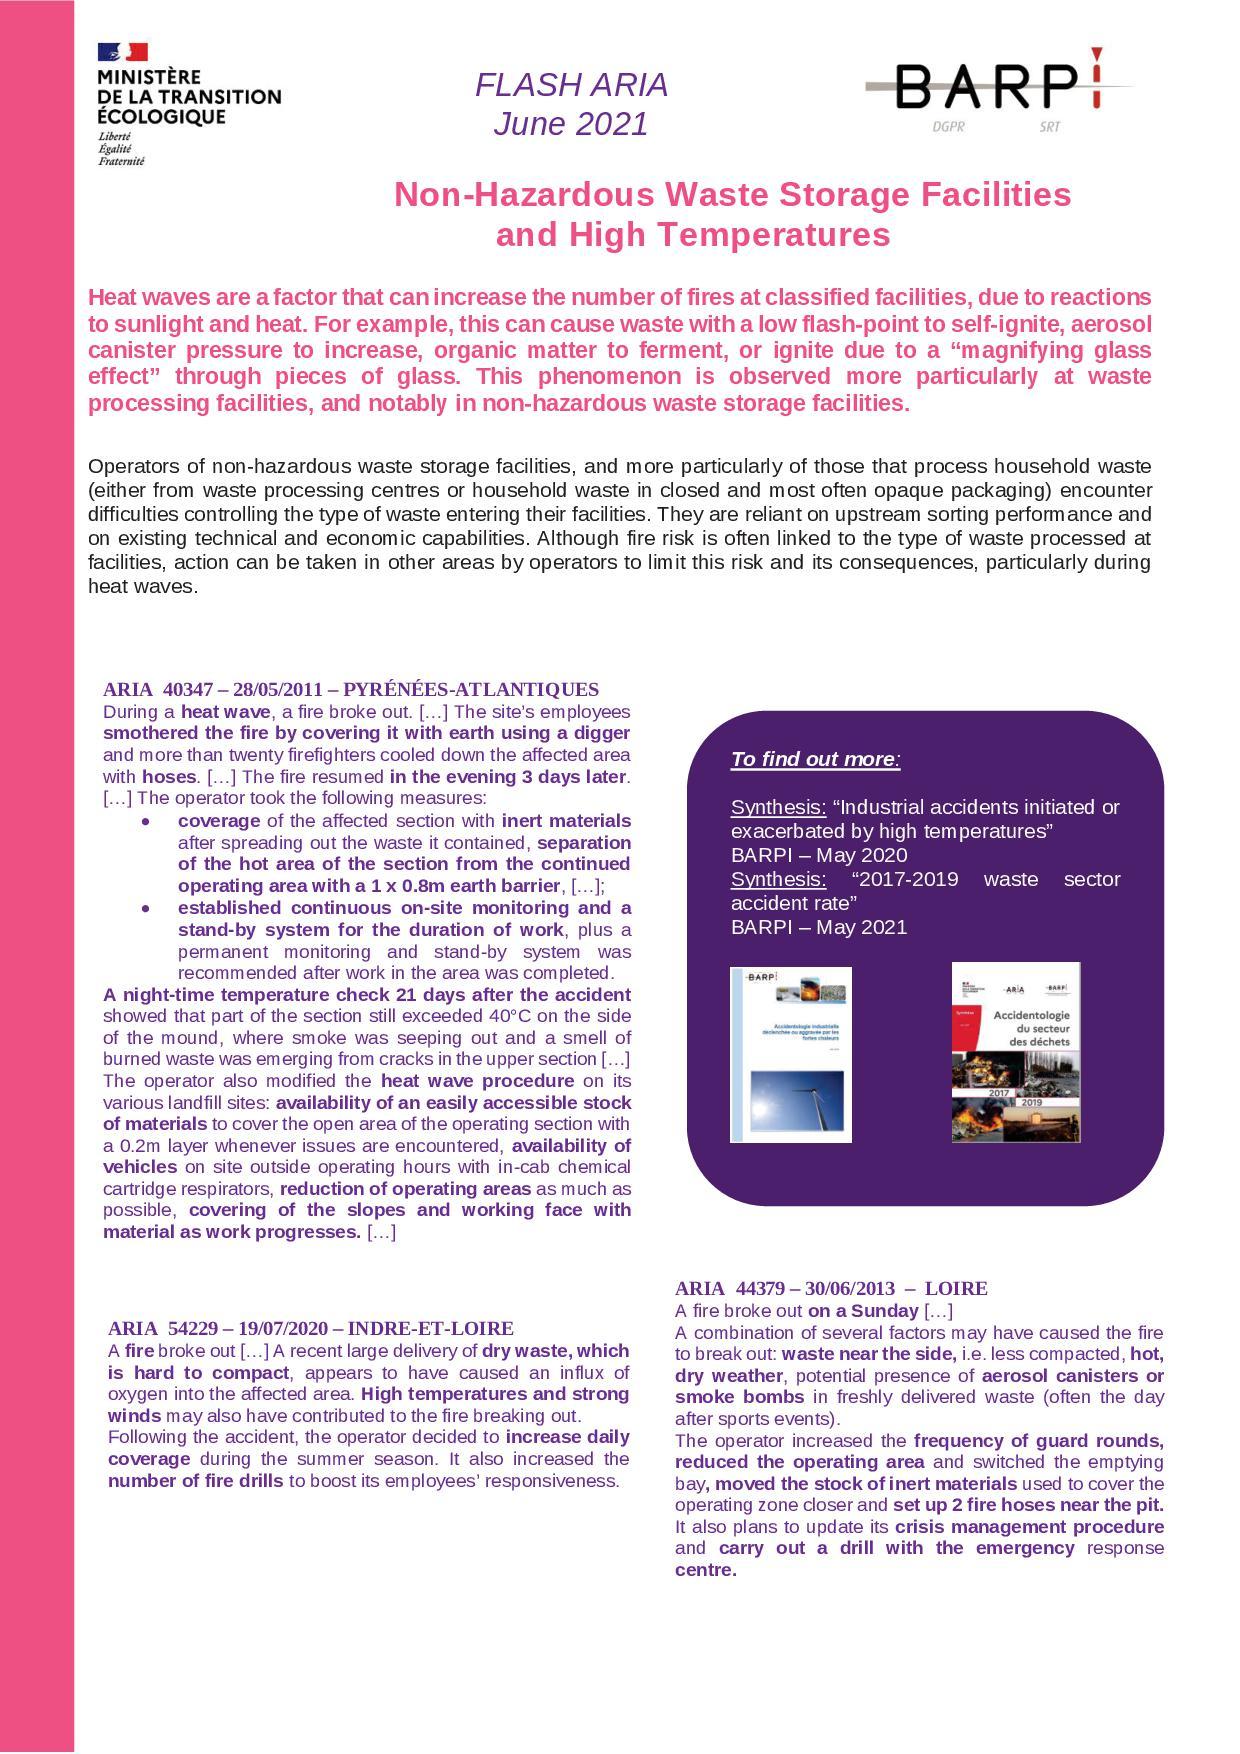 Non-Hazardous Waste Storage Facilities And High Temperatures